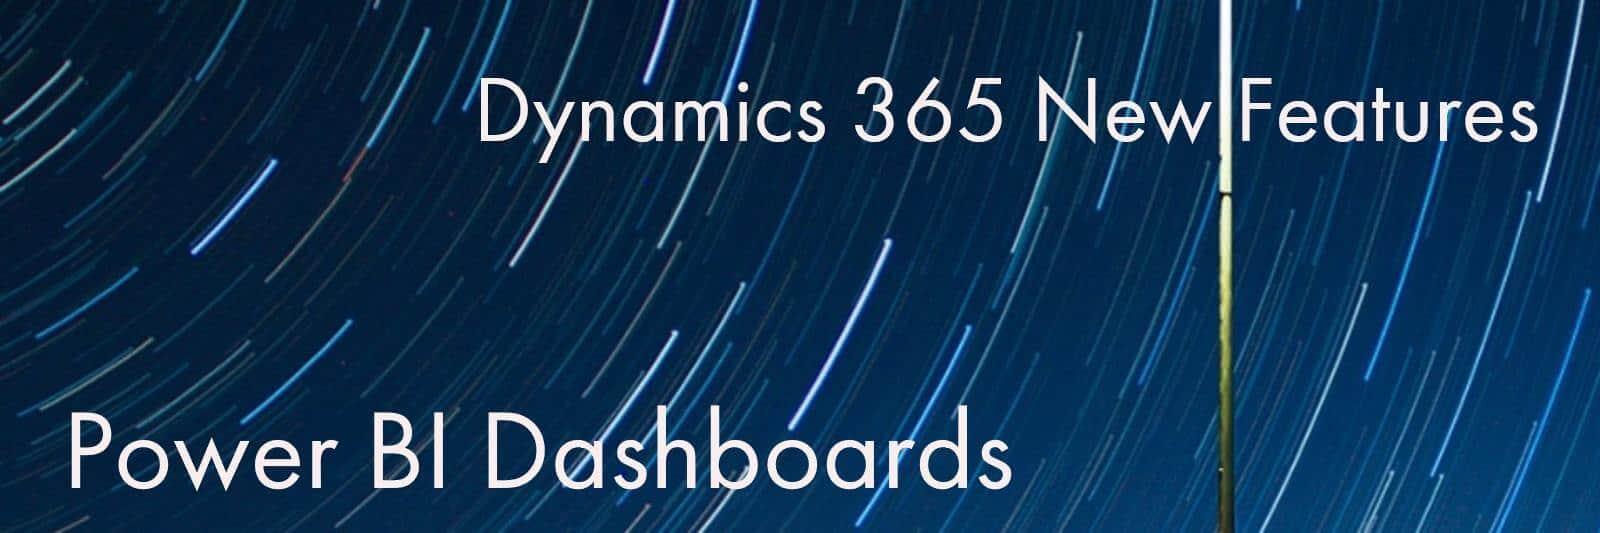 Dynamics 365 New Features – Power BI Visualizations